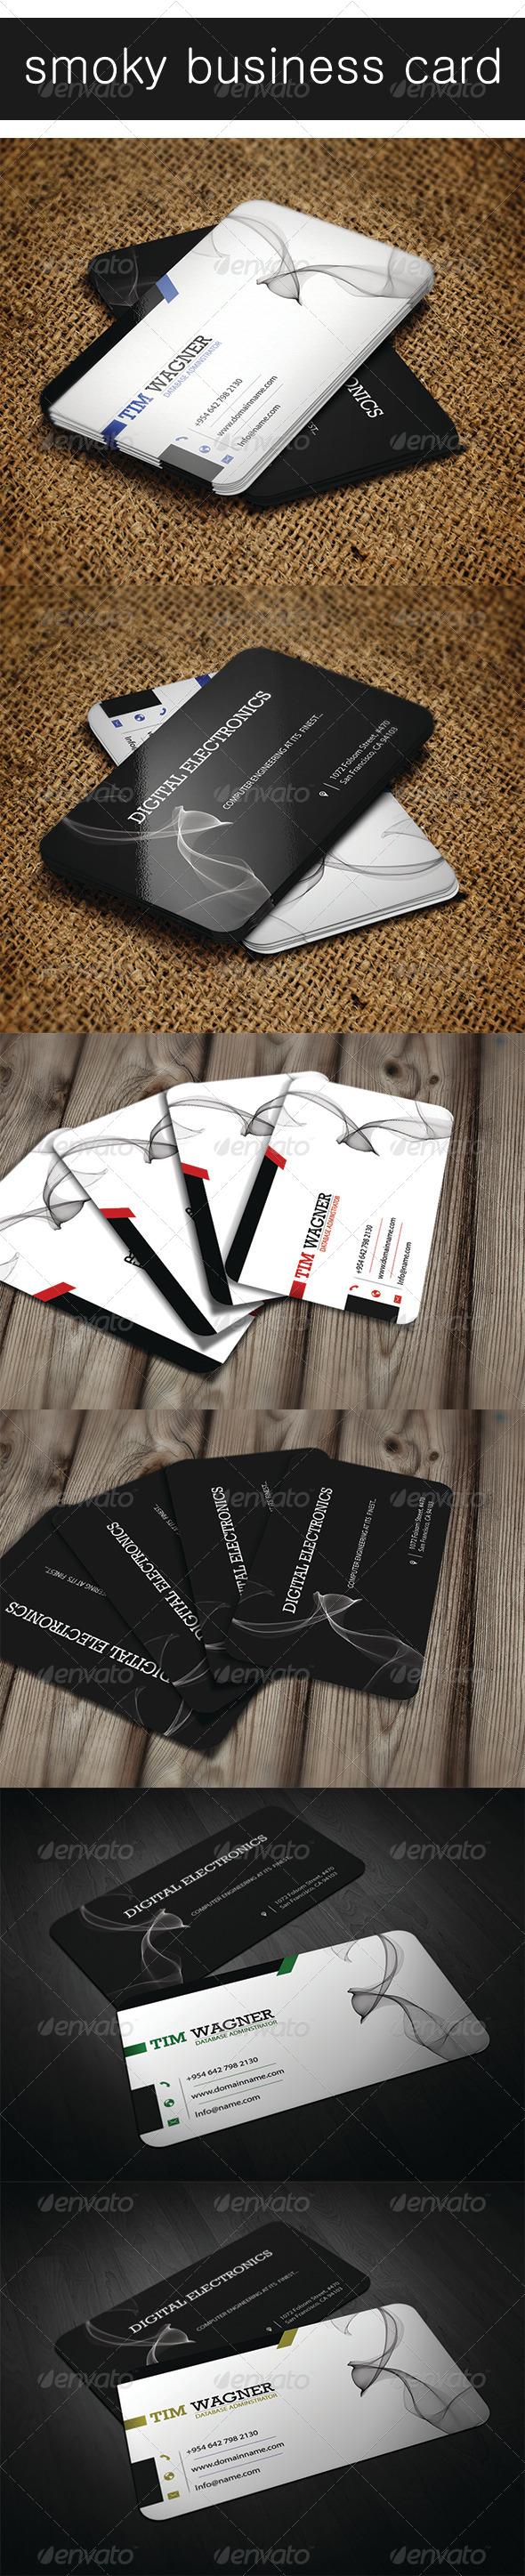 Smoky Business Card - Creative Business Cards